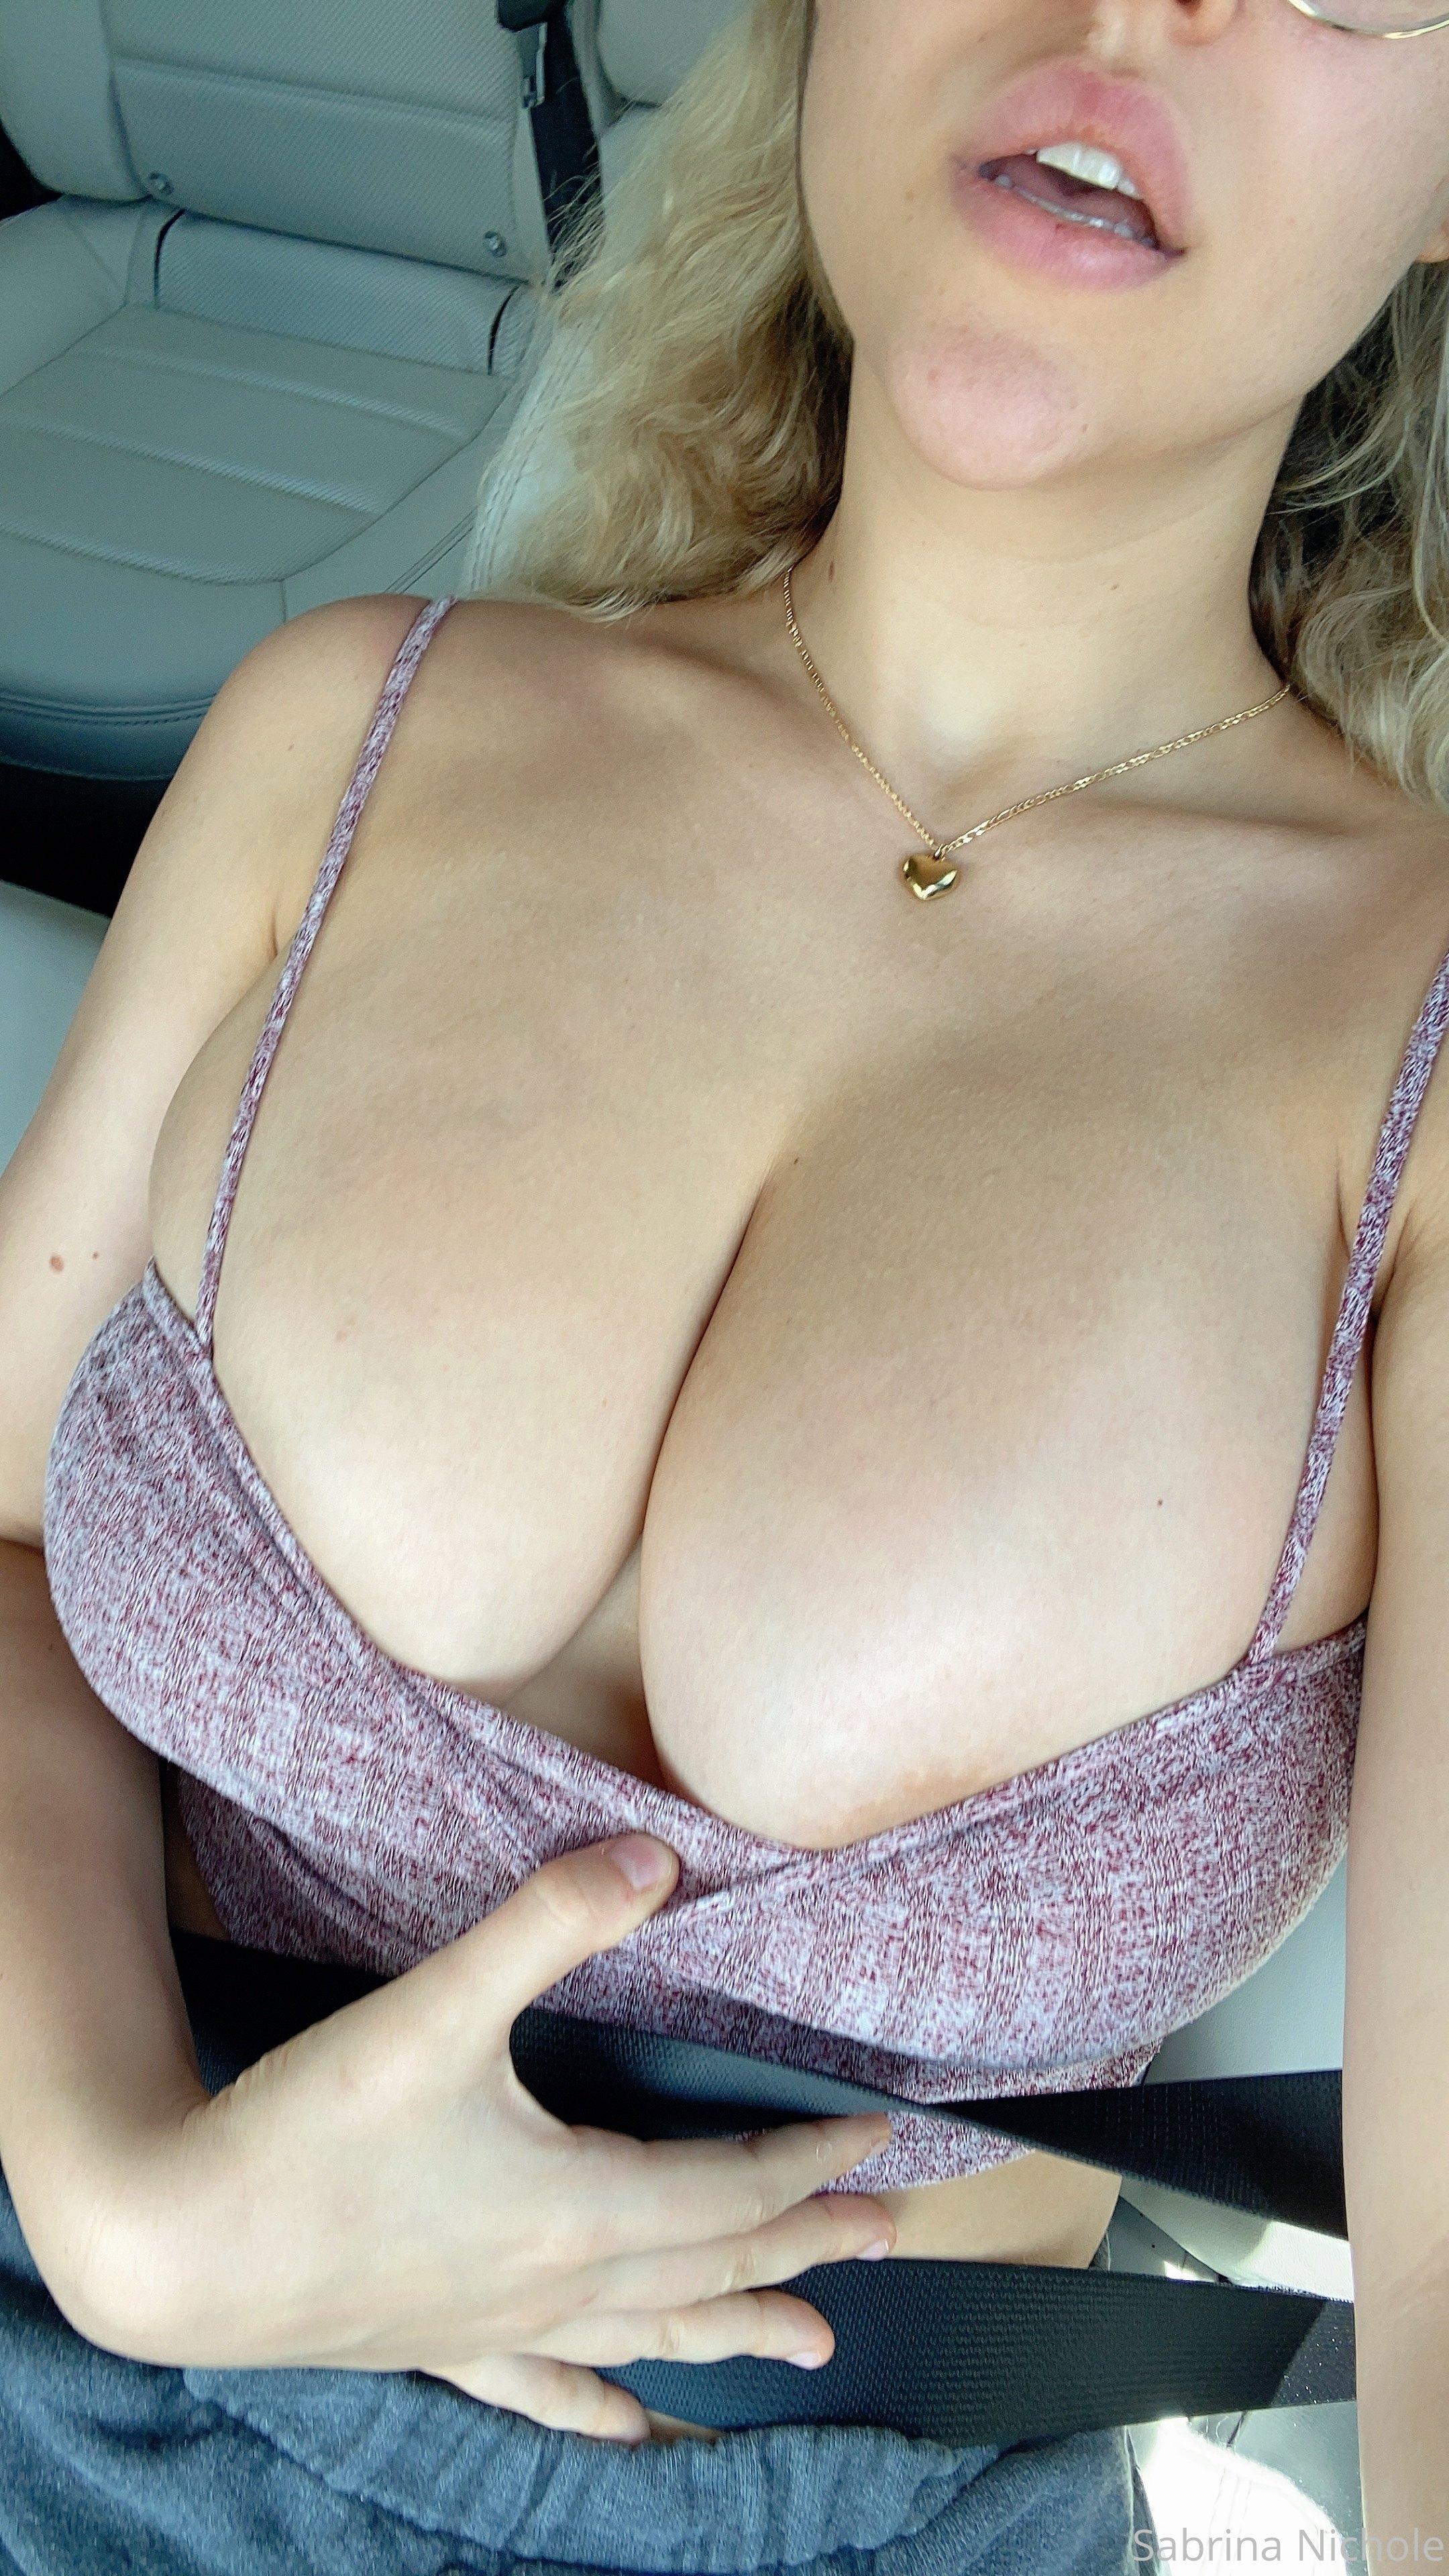 Sabrina Nichole 0115